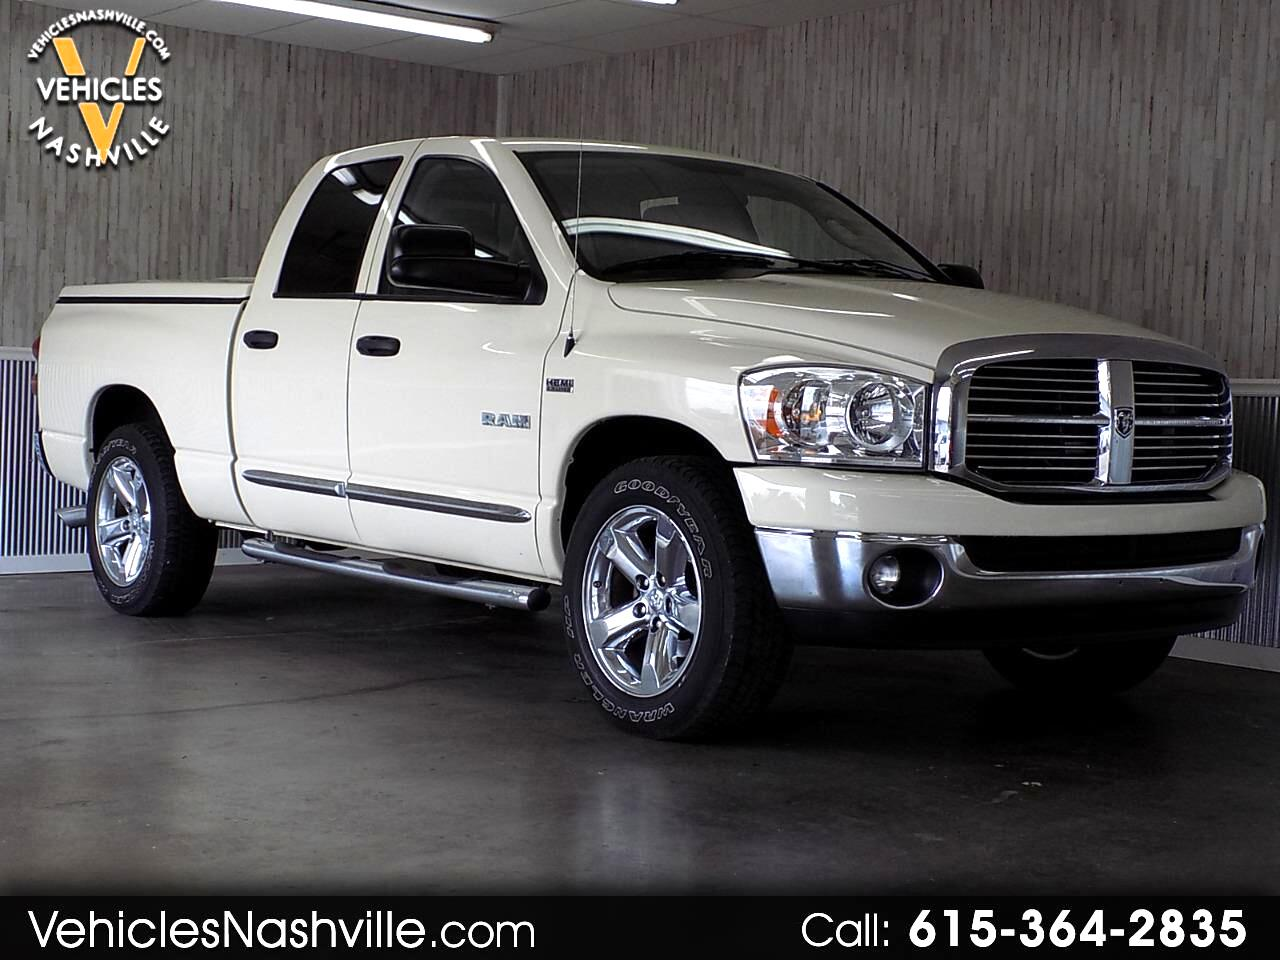 2008 Dodge Ram 1500  for sale VIN: 1D7HA18208J209794